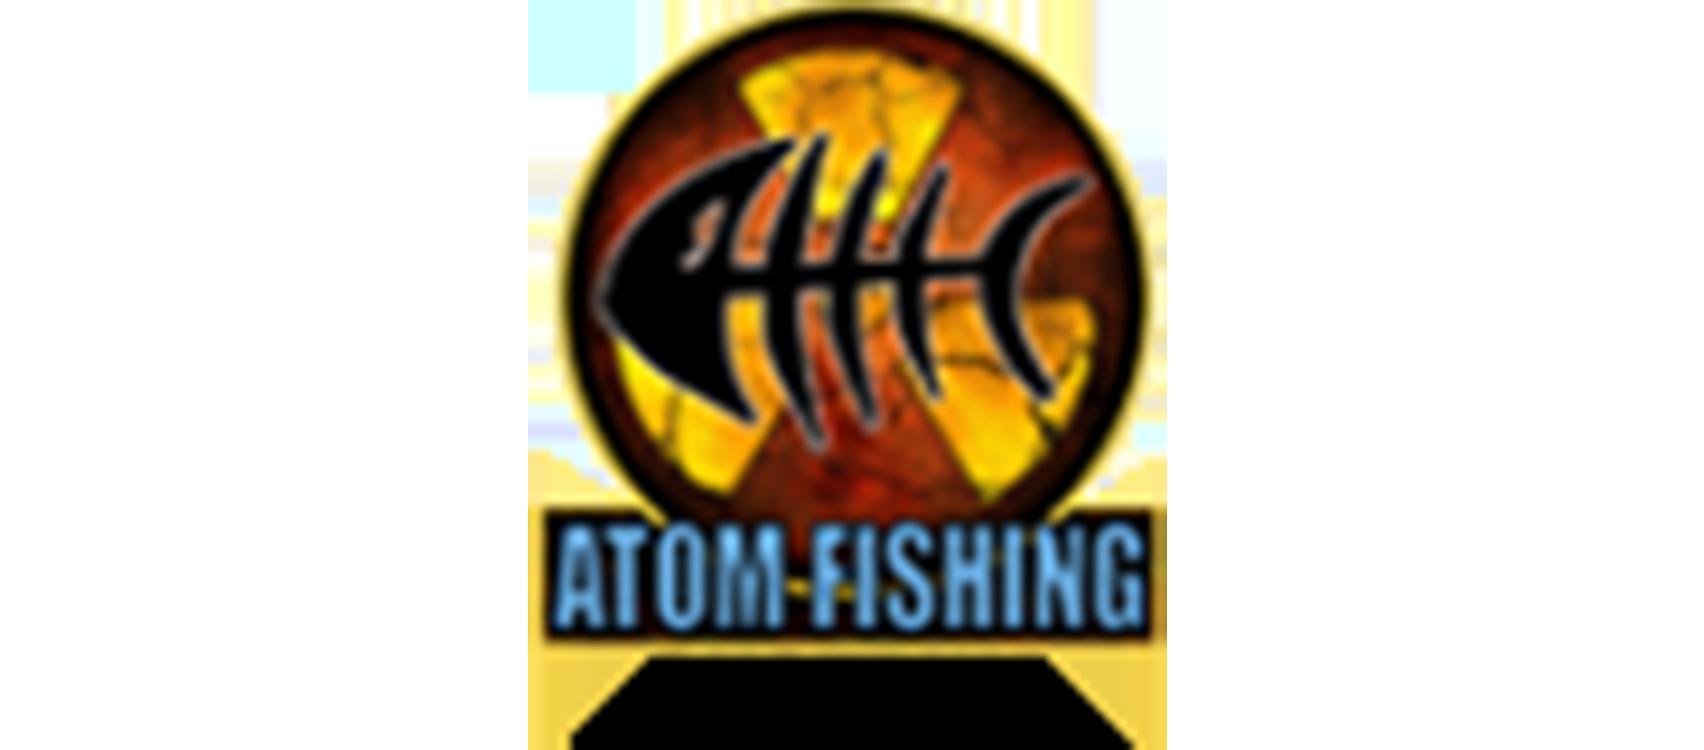 Atom fishing Экстрим  (lg)